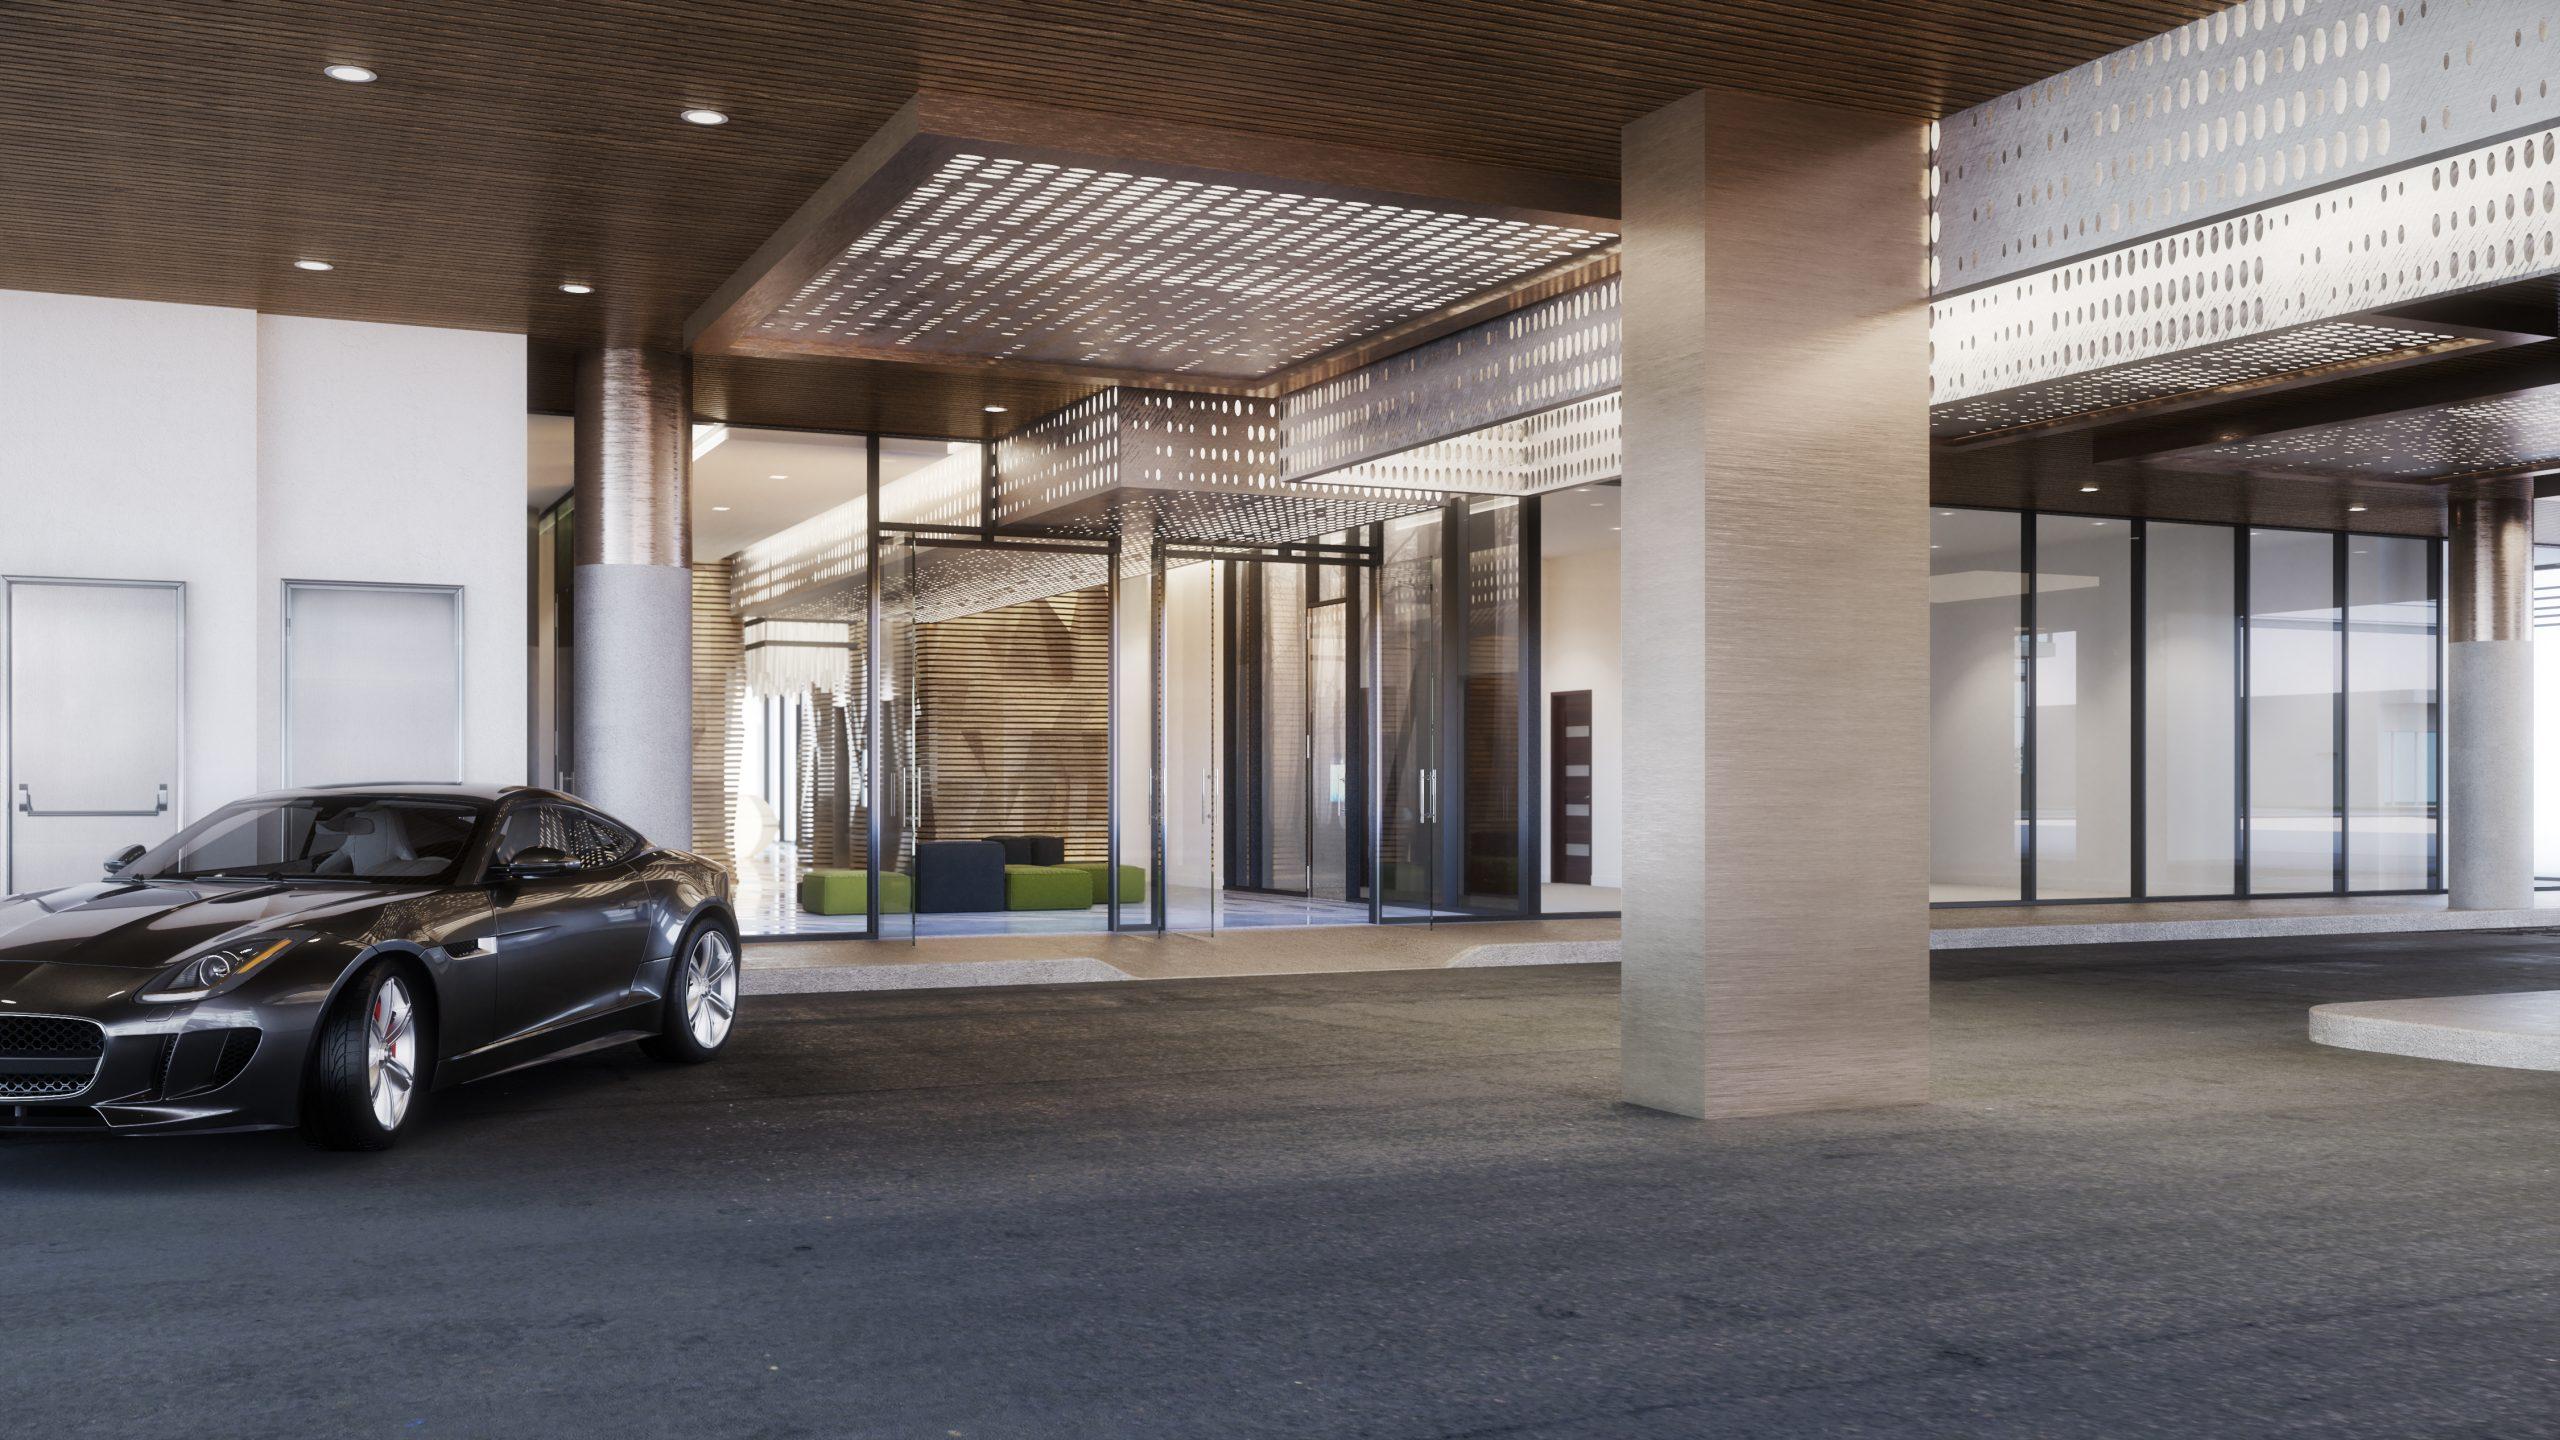 Houston Medical Center Coming Spring 2019 Contour Interior Design